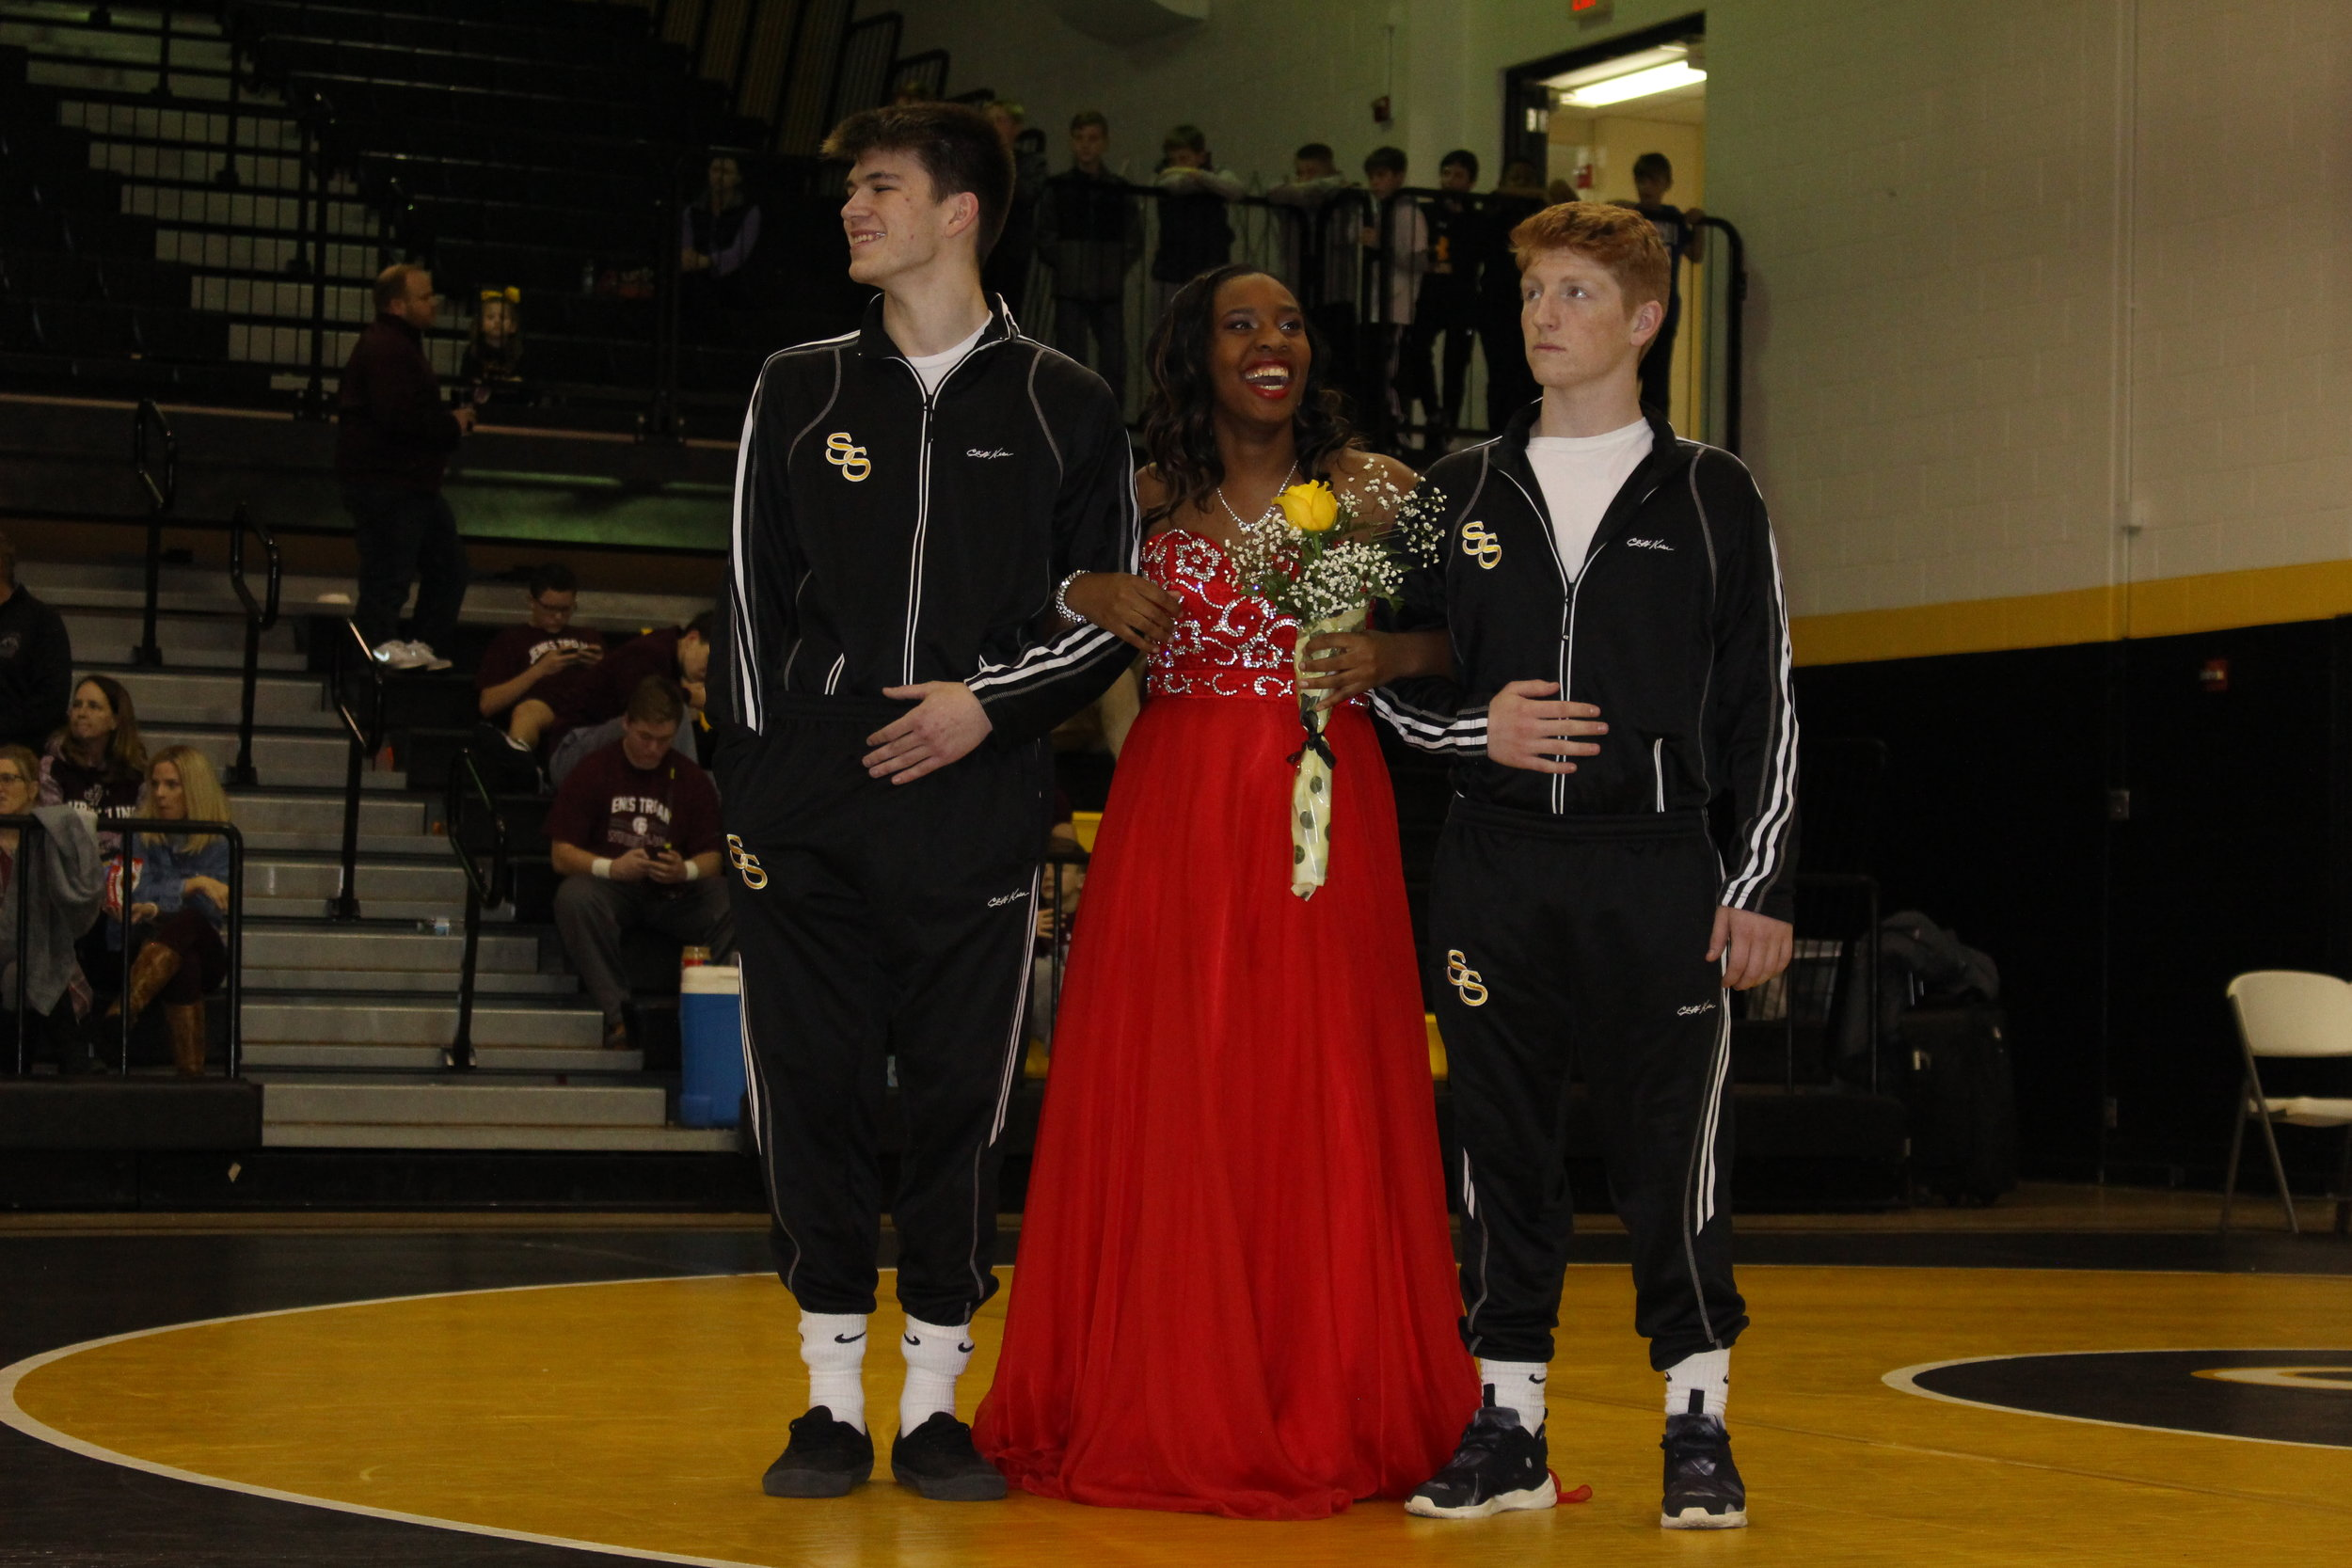 Homecoming Queen Candidate Jasmine Brown, escorted by Derek Davis and Mikey Burns.